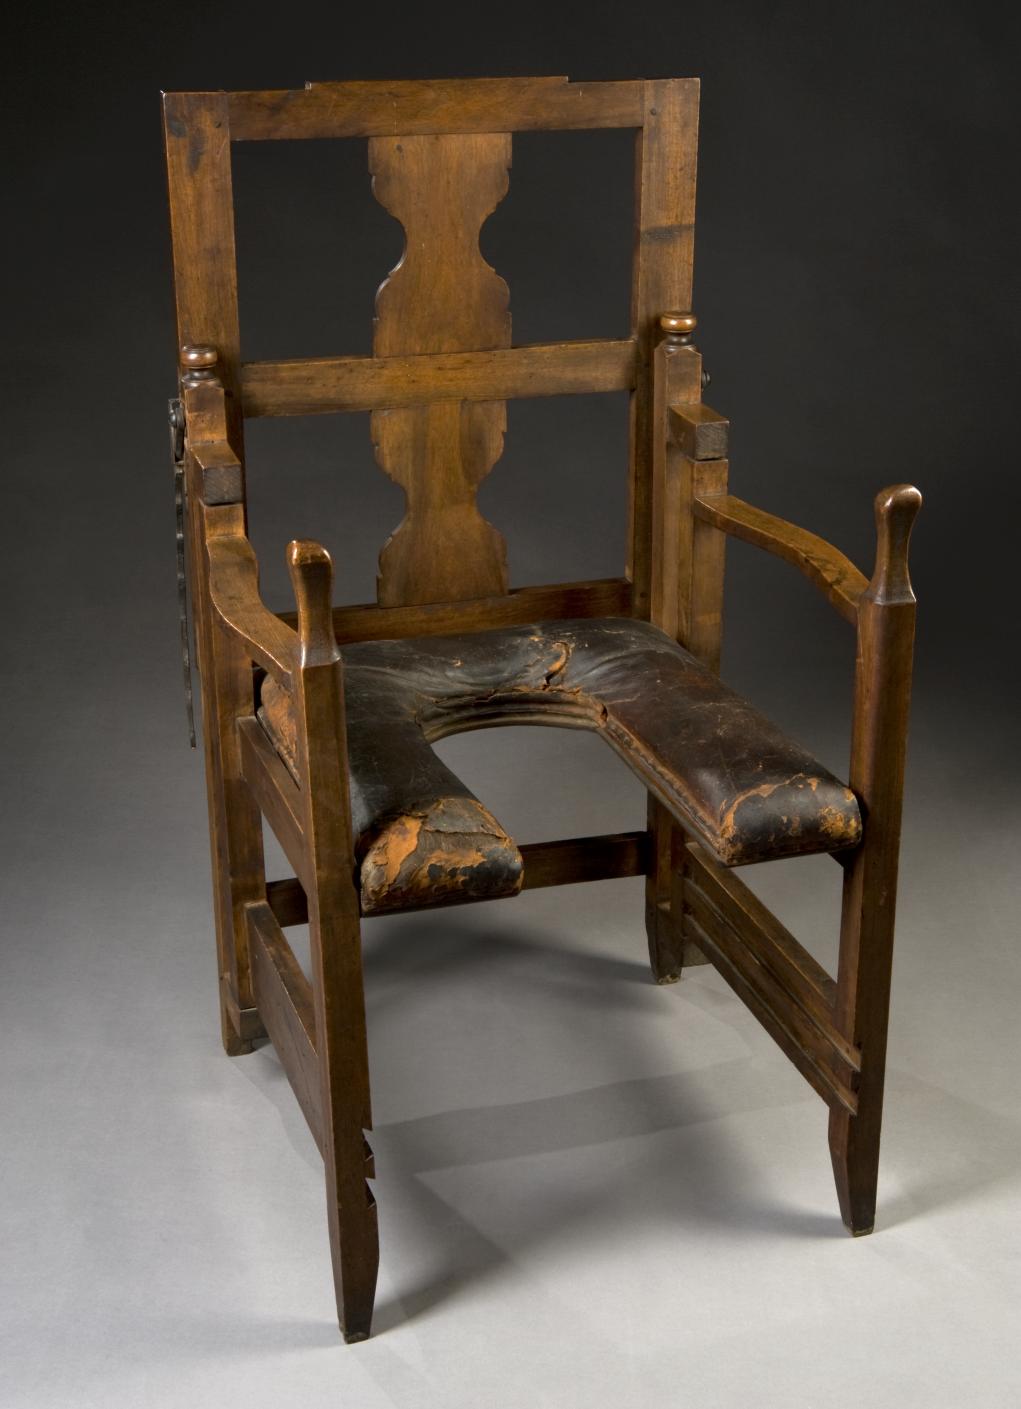 Antique birthing chair -  Via Tywkiwdbi